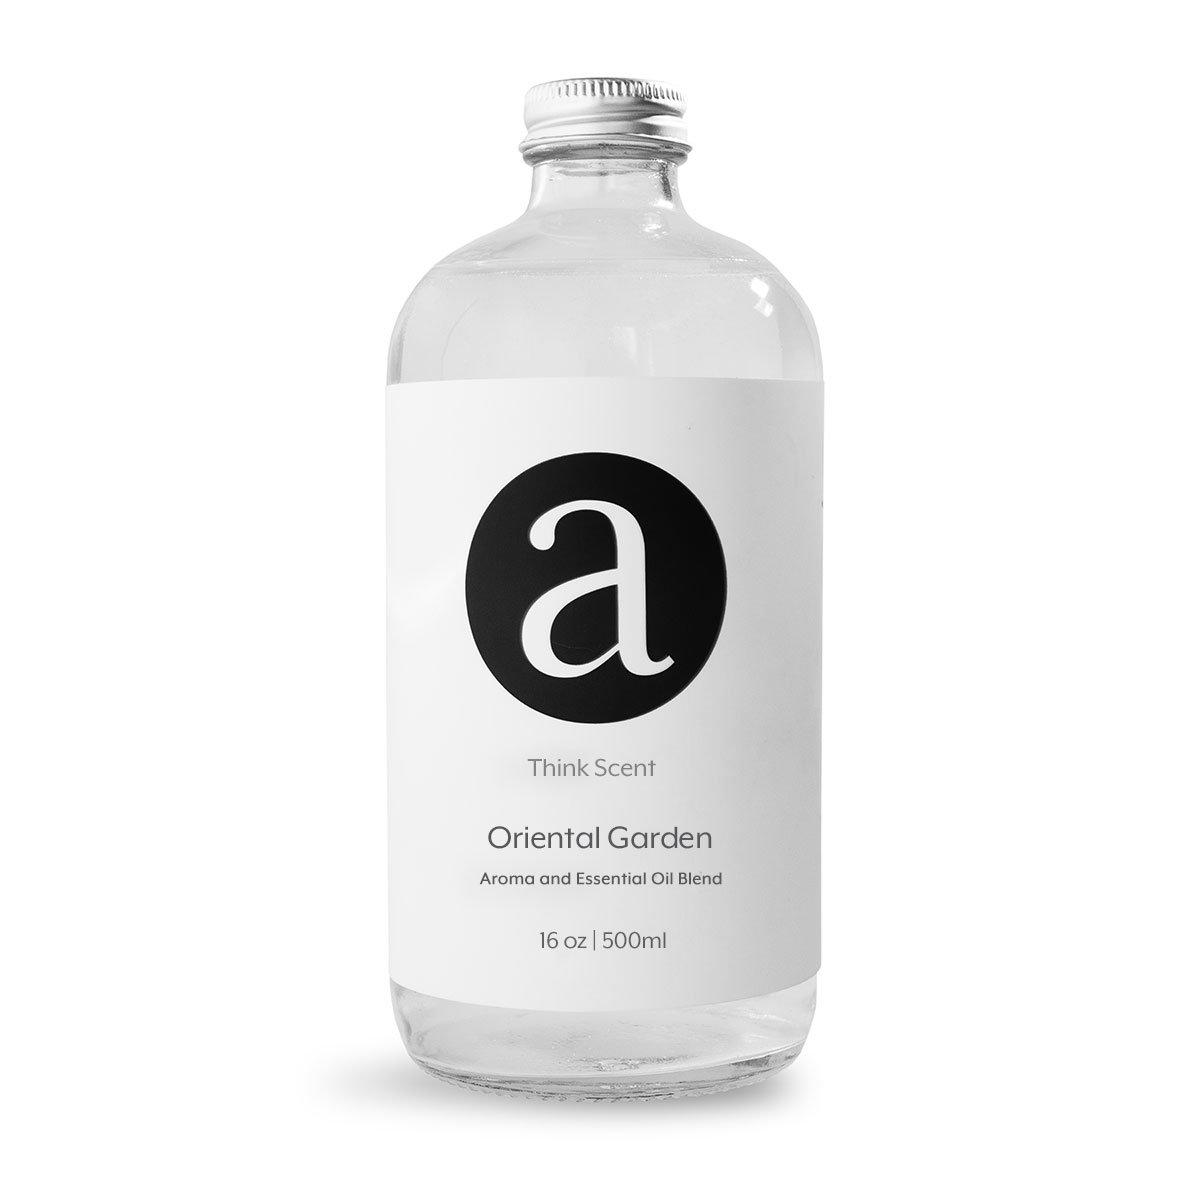 (Oriental Garden) Aroma / Fragrance Oil For AromaTech Air Freshener Scent Diffuser (500ml)